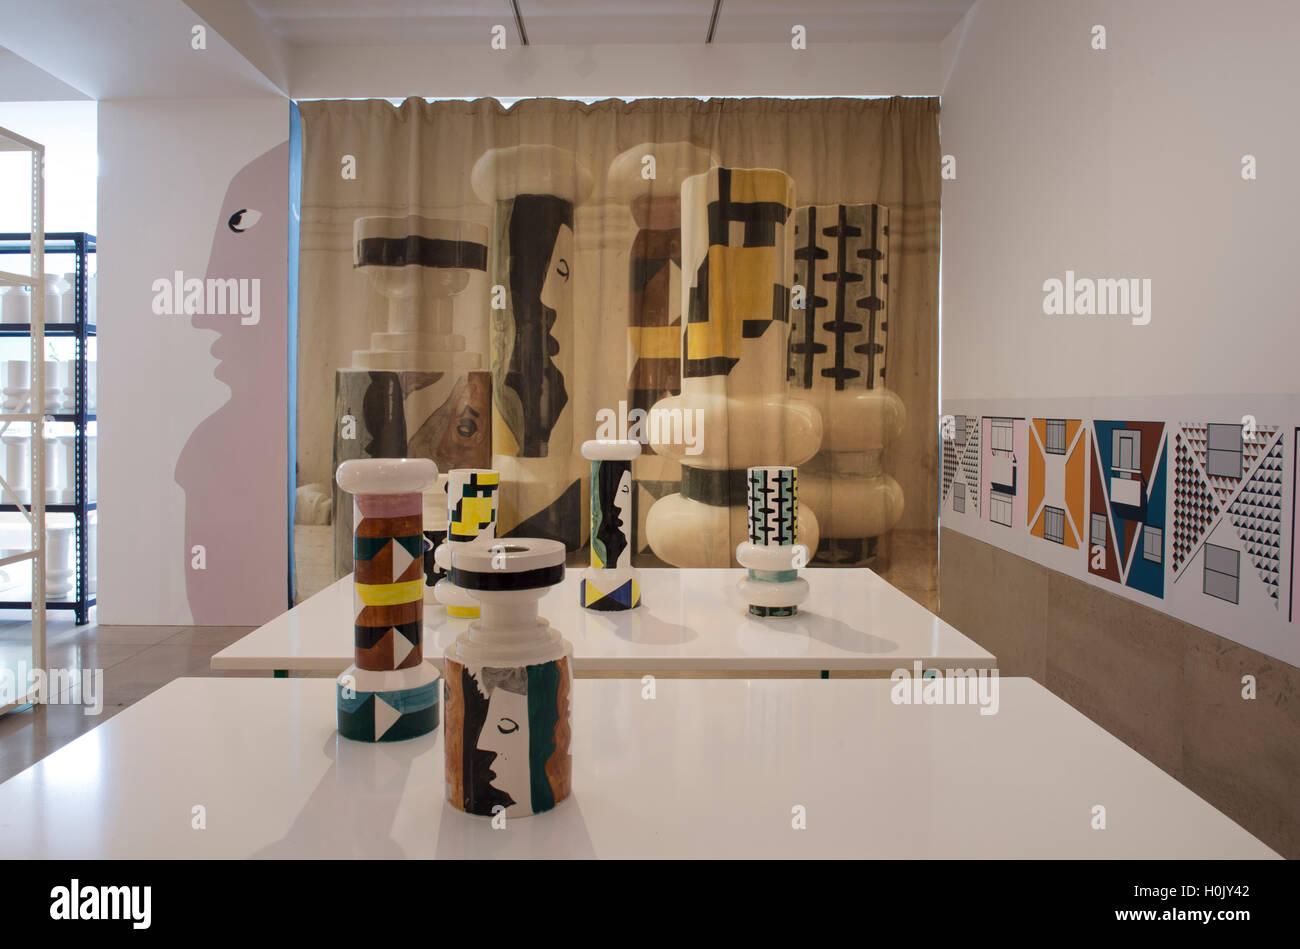 RIBA Architecture Gallery London UK 21st September 2016 Stock